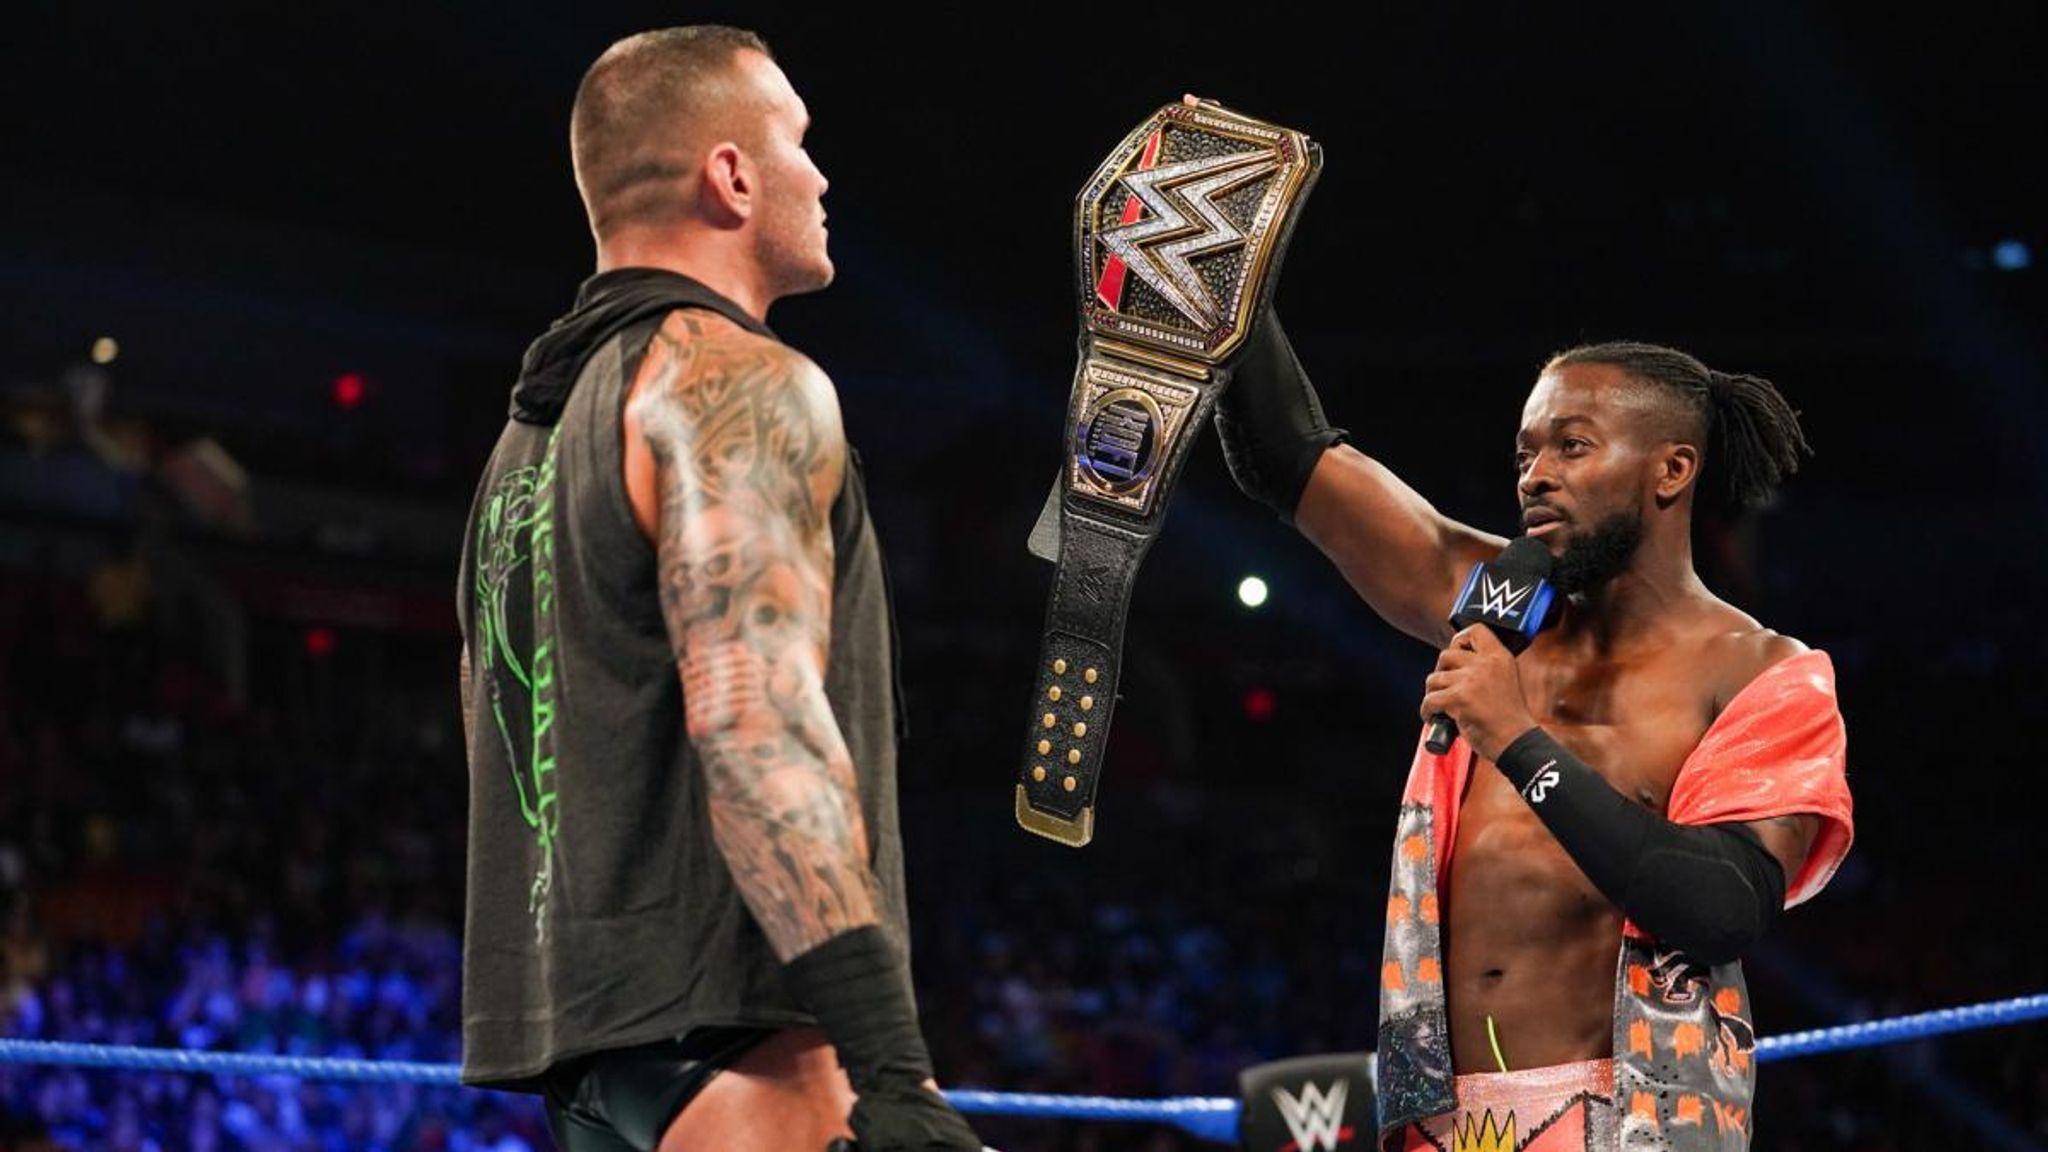 Kofi Kingston: Defeating Orton would be career-defining